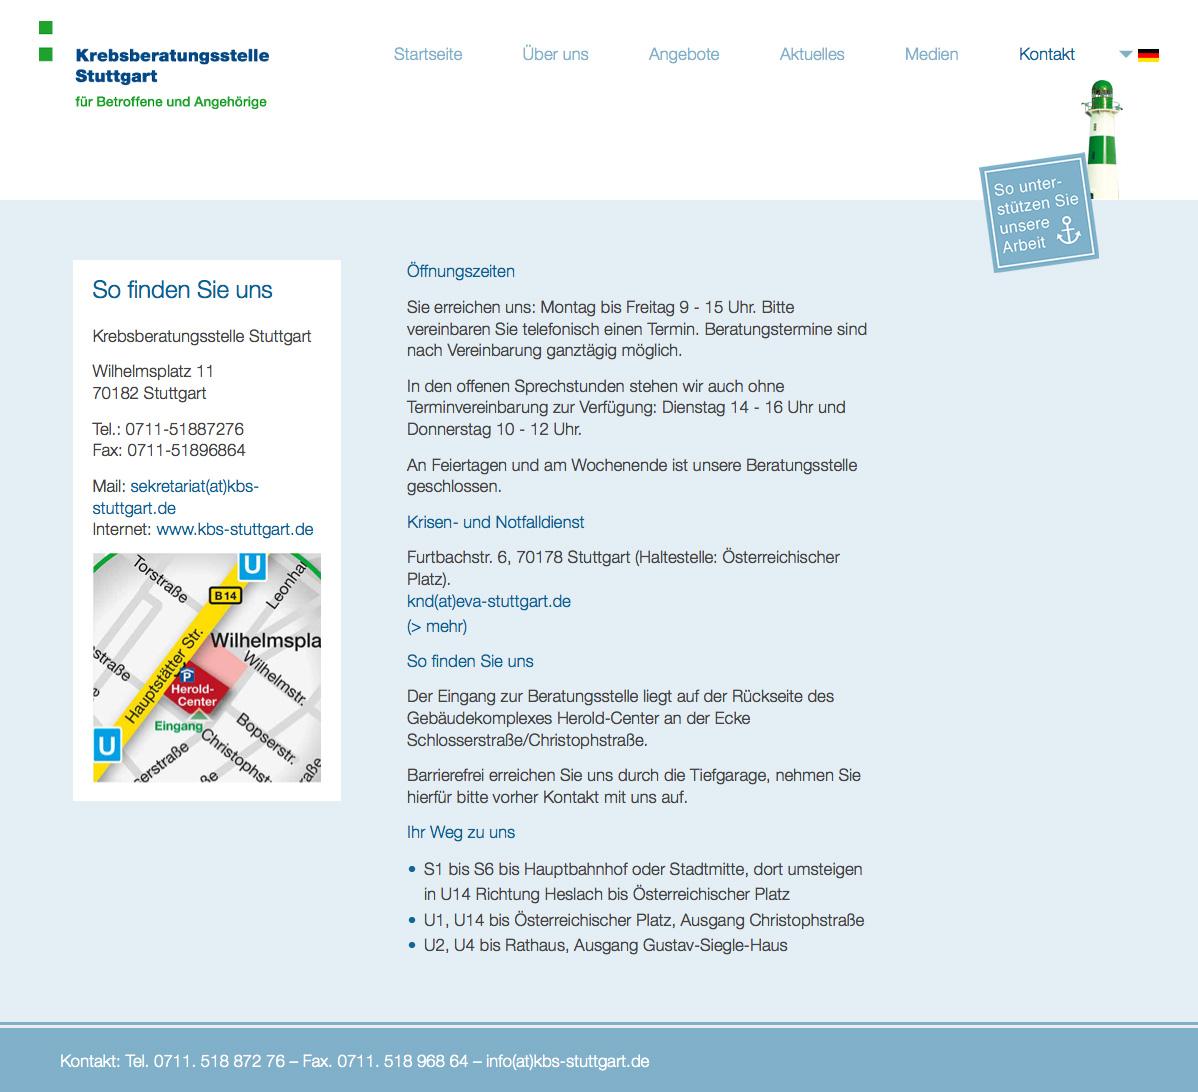 Krebsberatungstelle Stuttgart